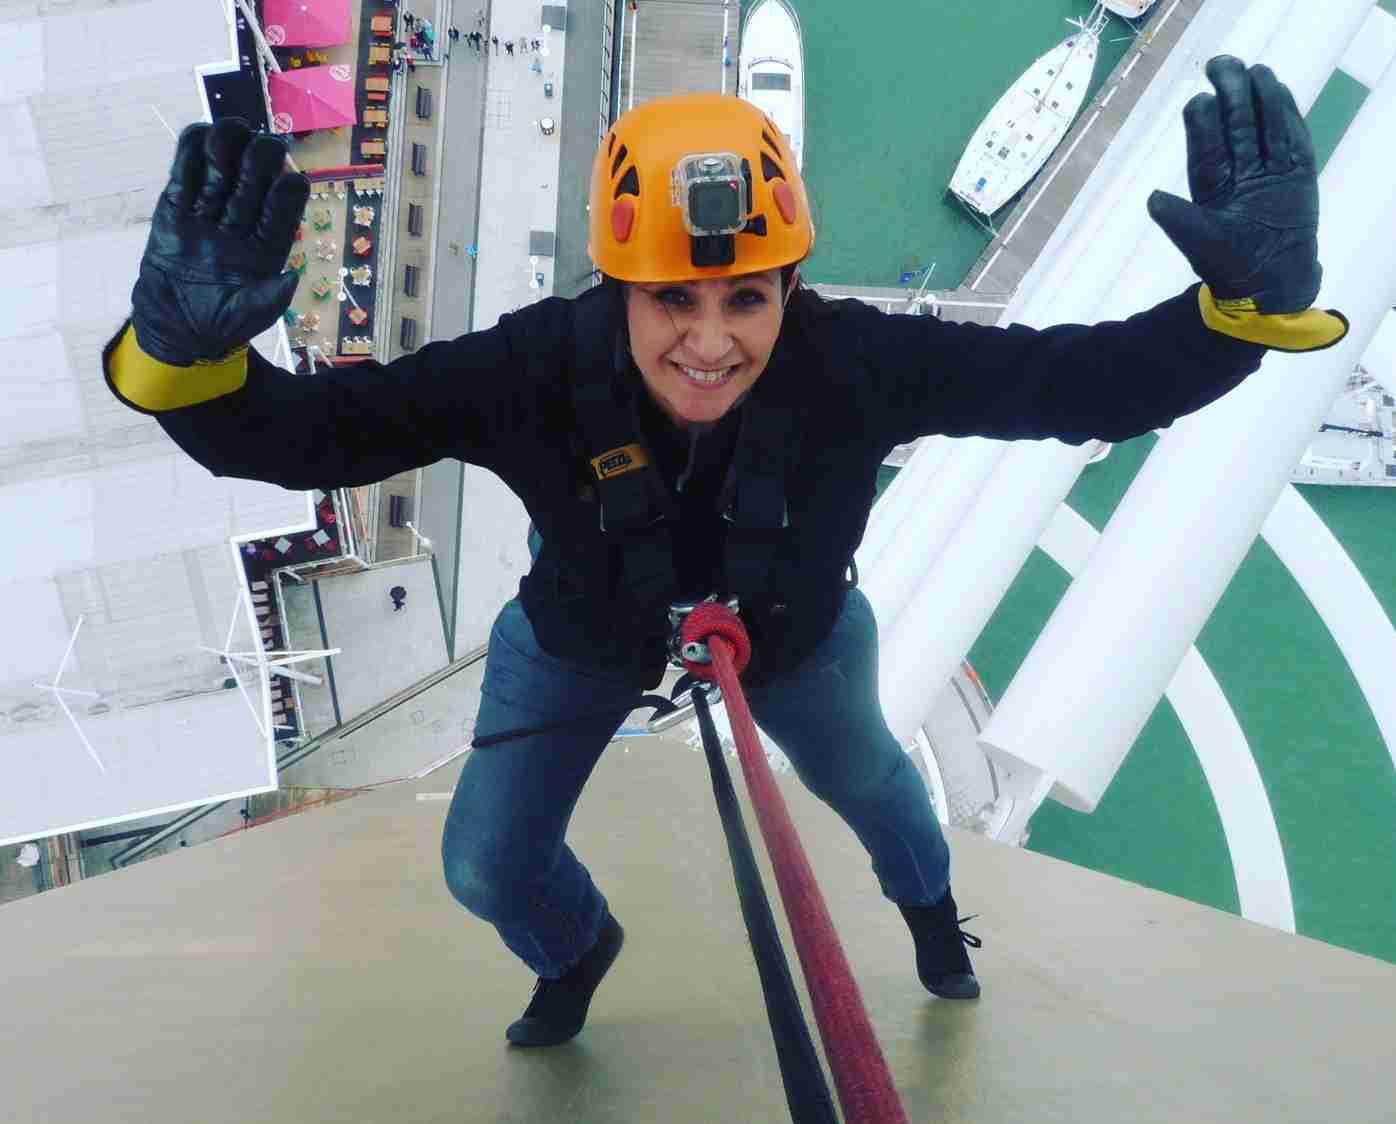 Tania Sullivan Spinnaker Tower Abseil